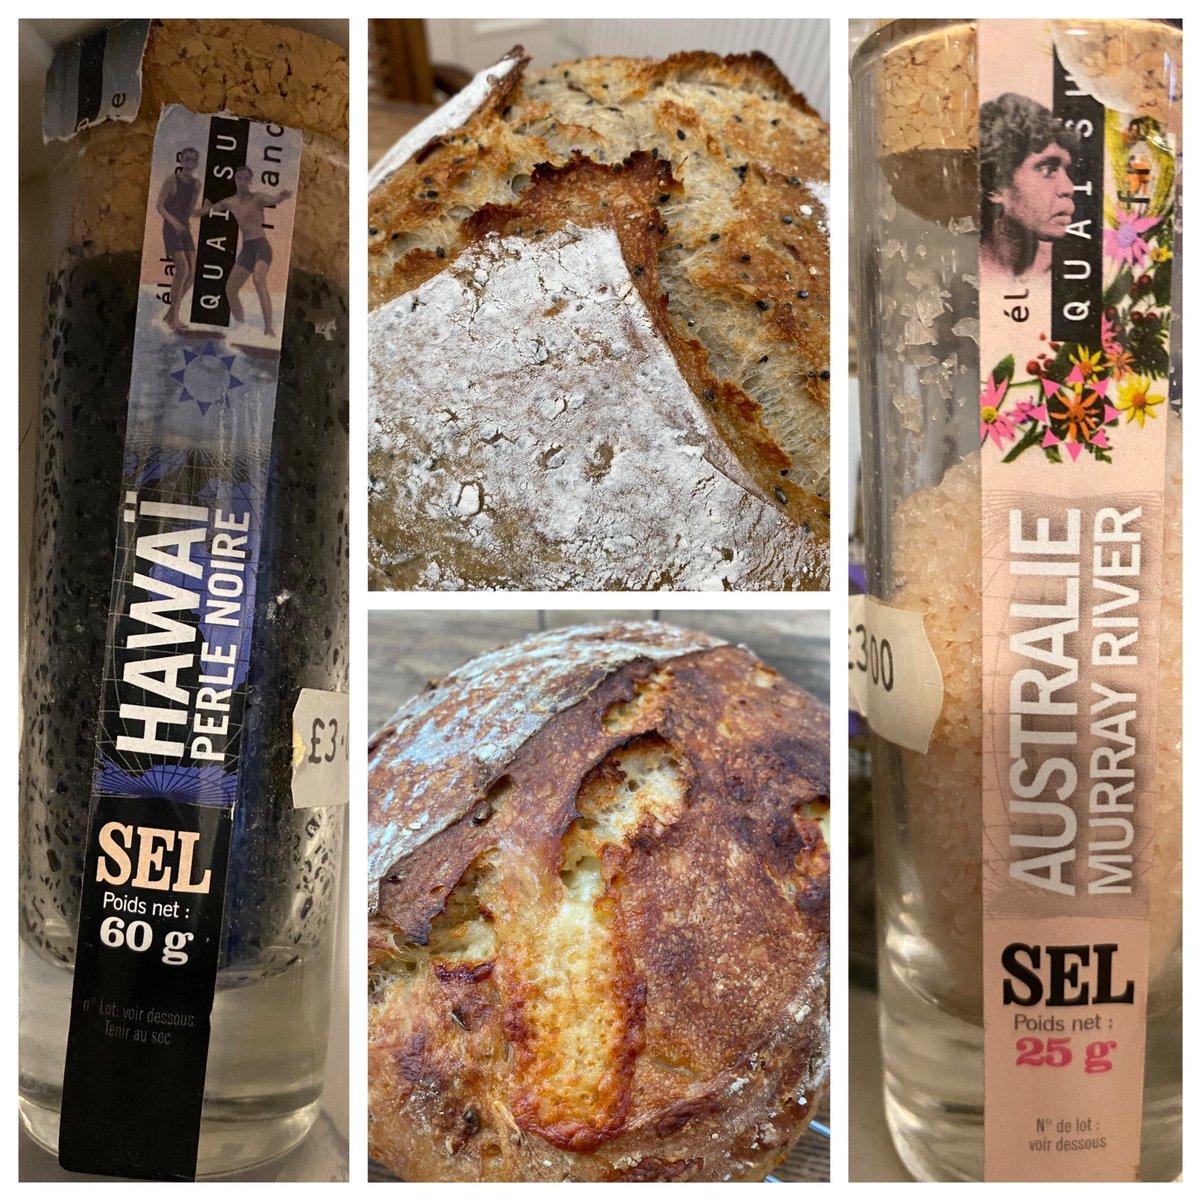 Some #sourdough #salt experimentation today #Australian #Murray #river and #Hawaiian #perle #noire #novacooksathome https://t.co/5GuxQFcuaE